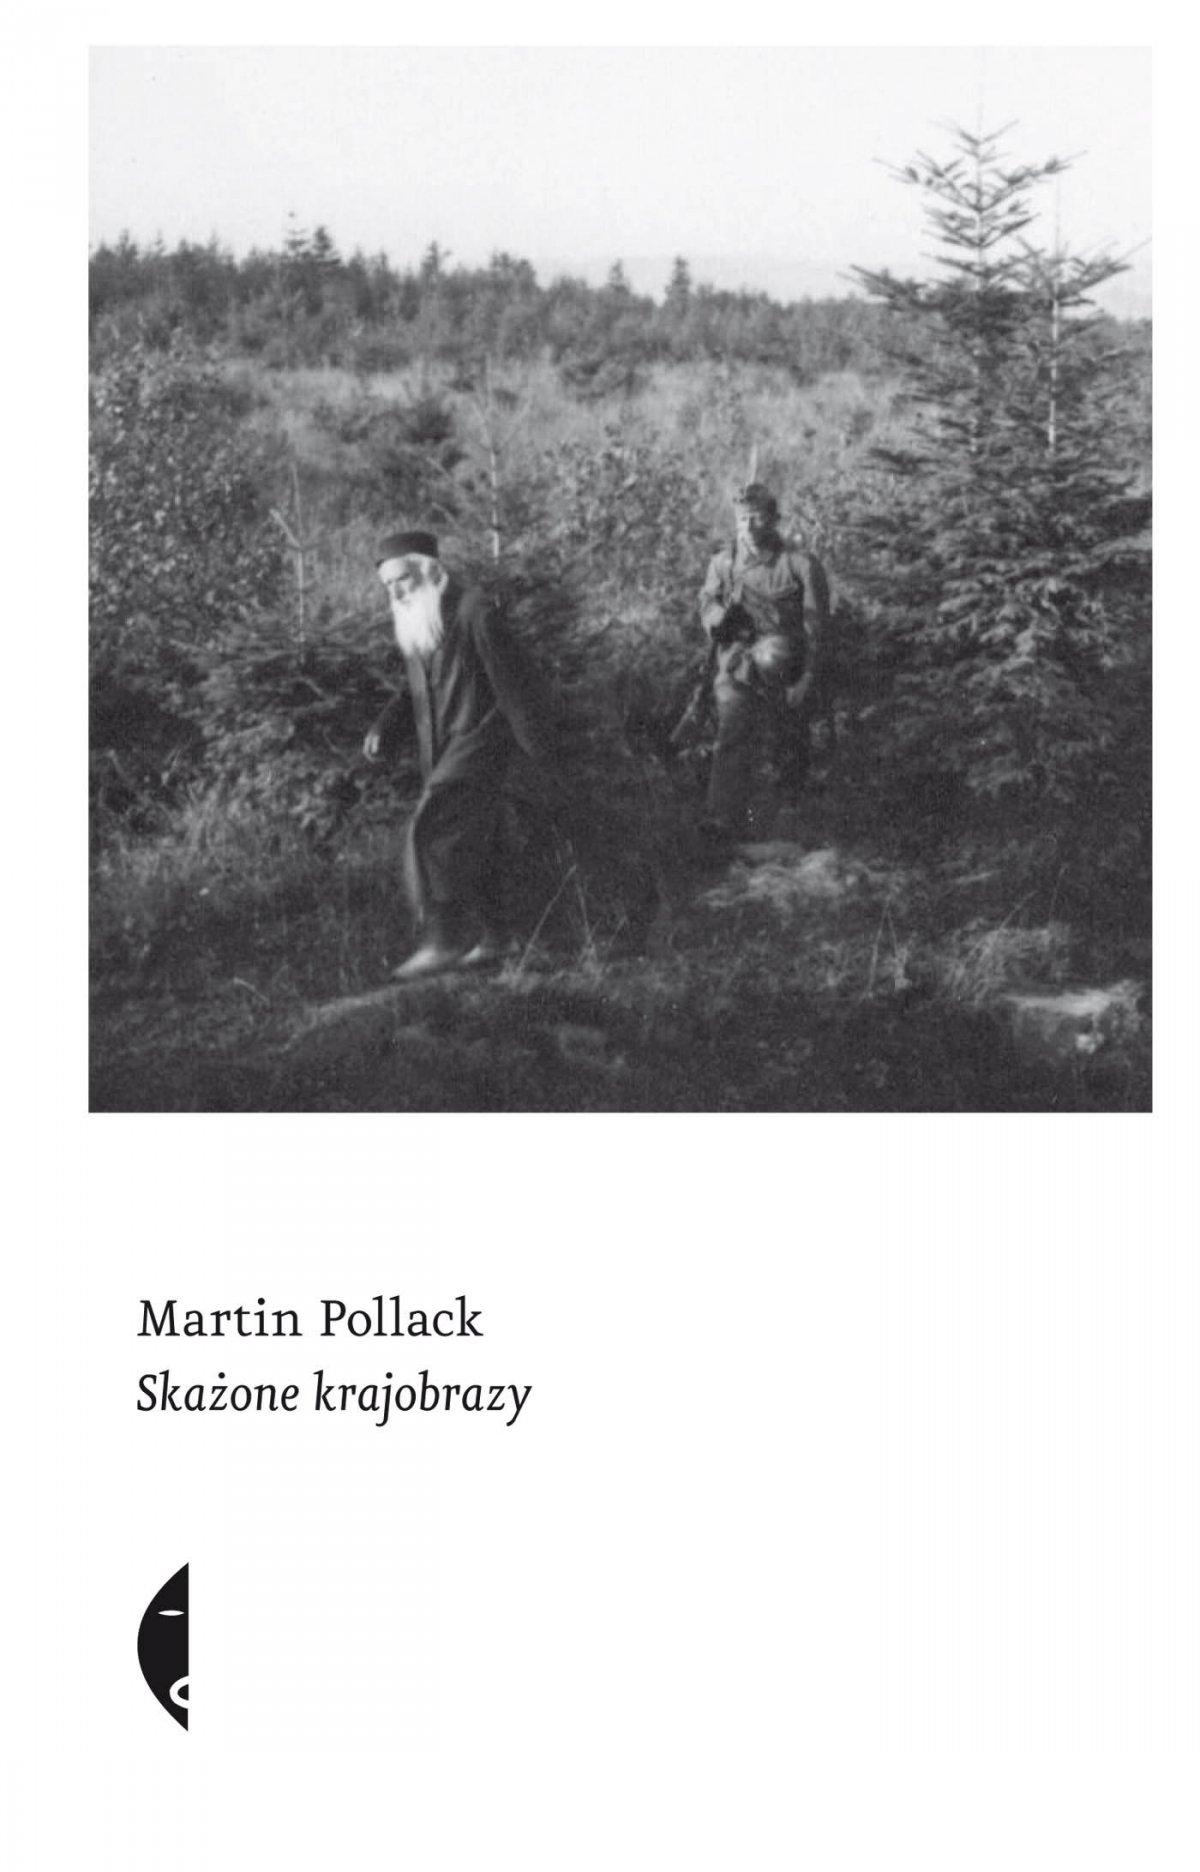 Skażone krajobrazy - Ebook (Książka na Kindle) do pobrania w formacie MOBI